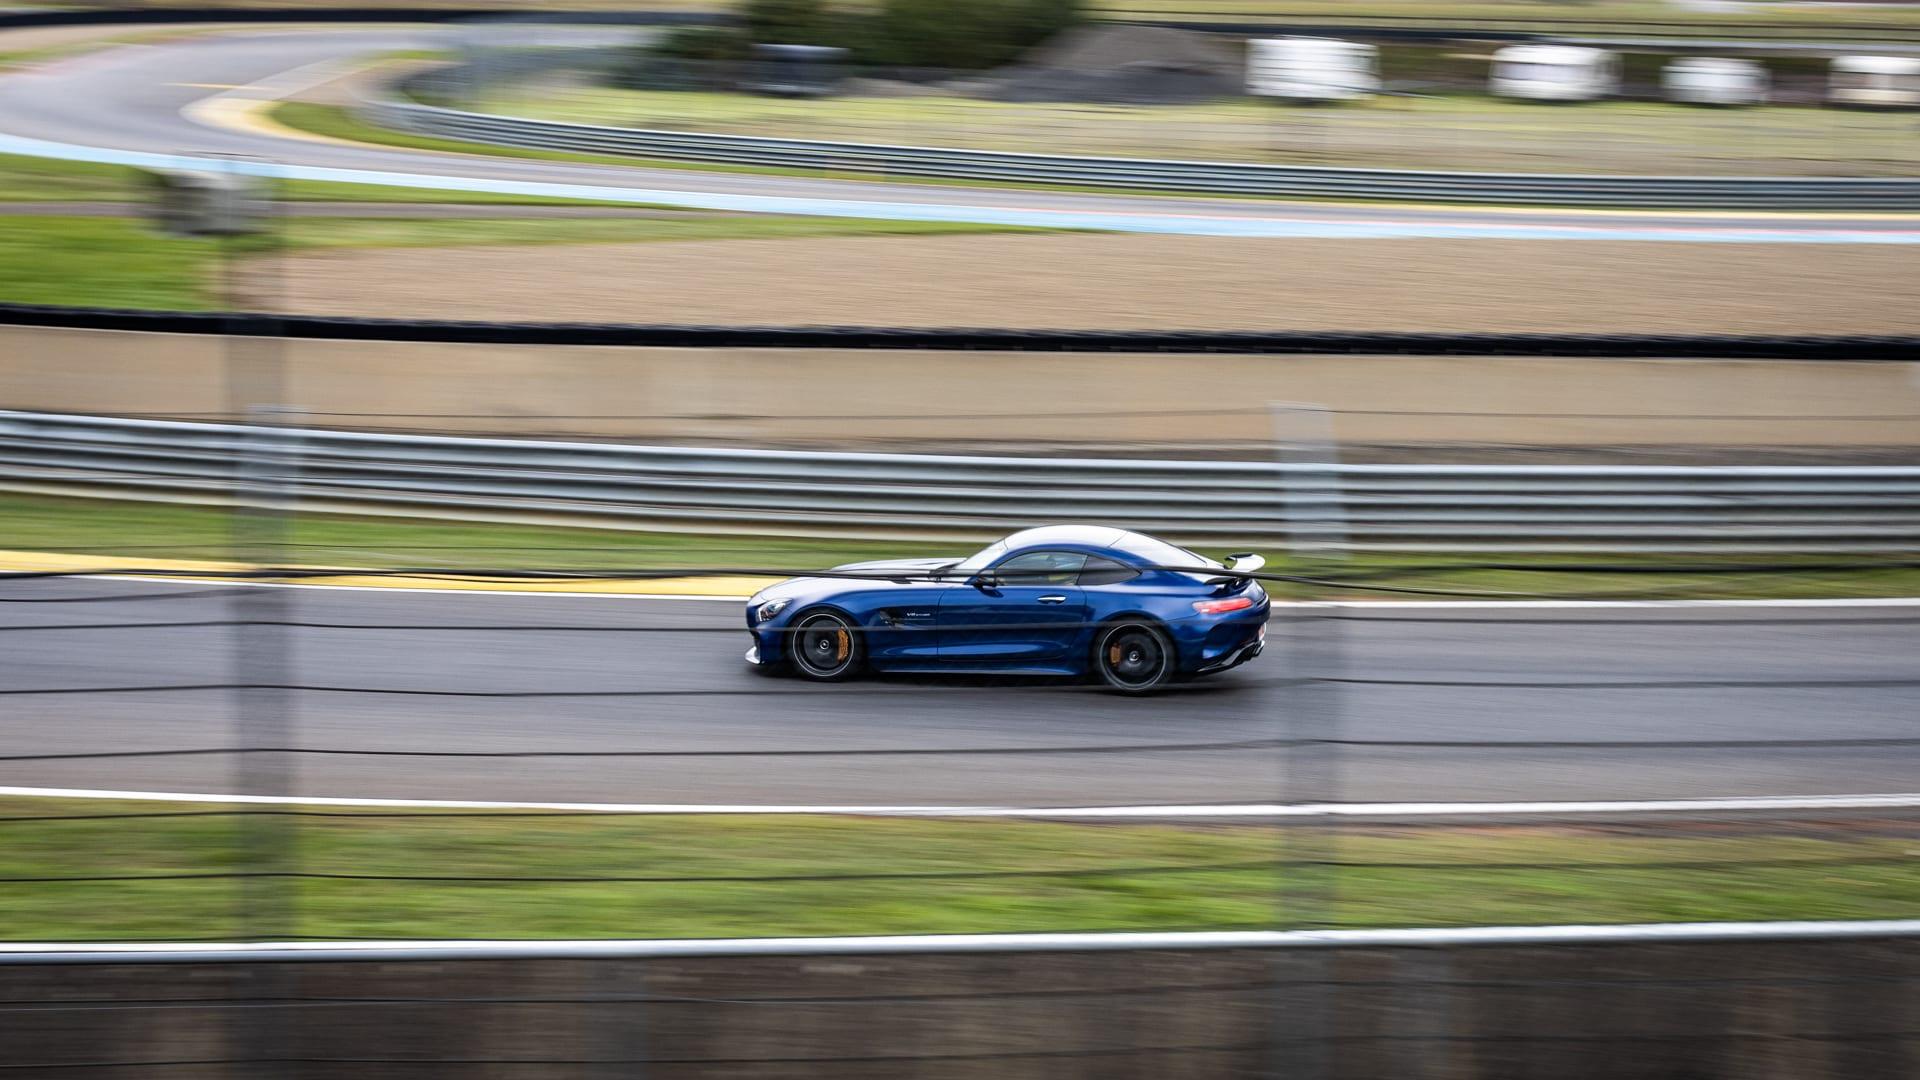 Blue AMG GTR